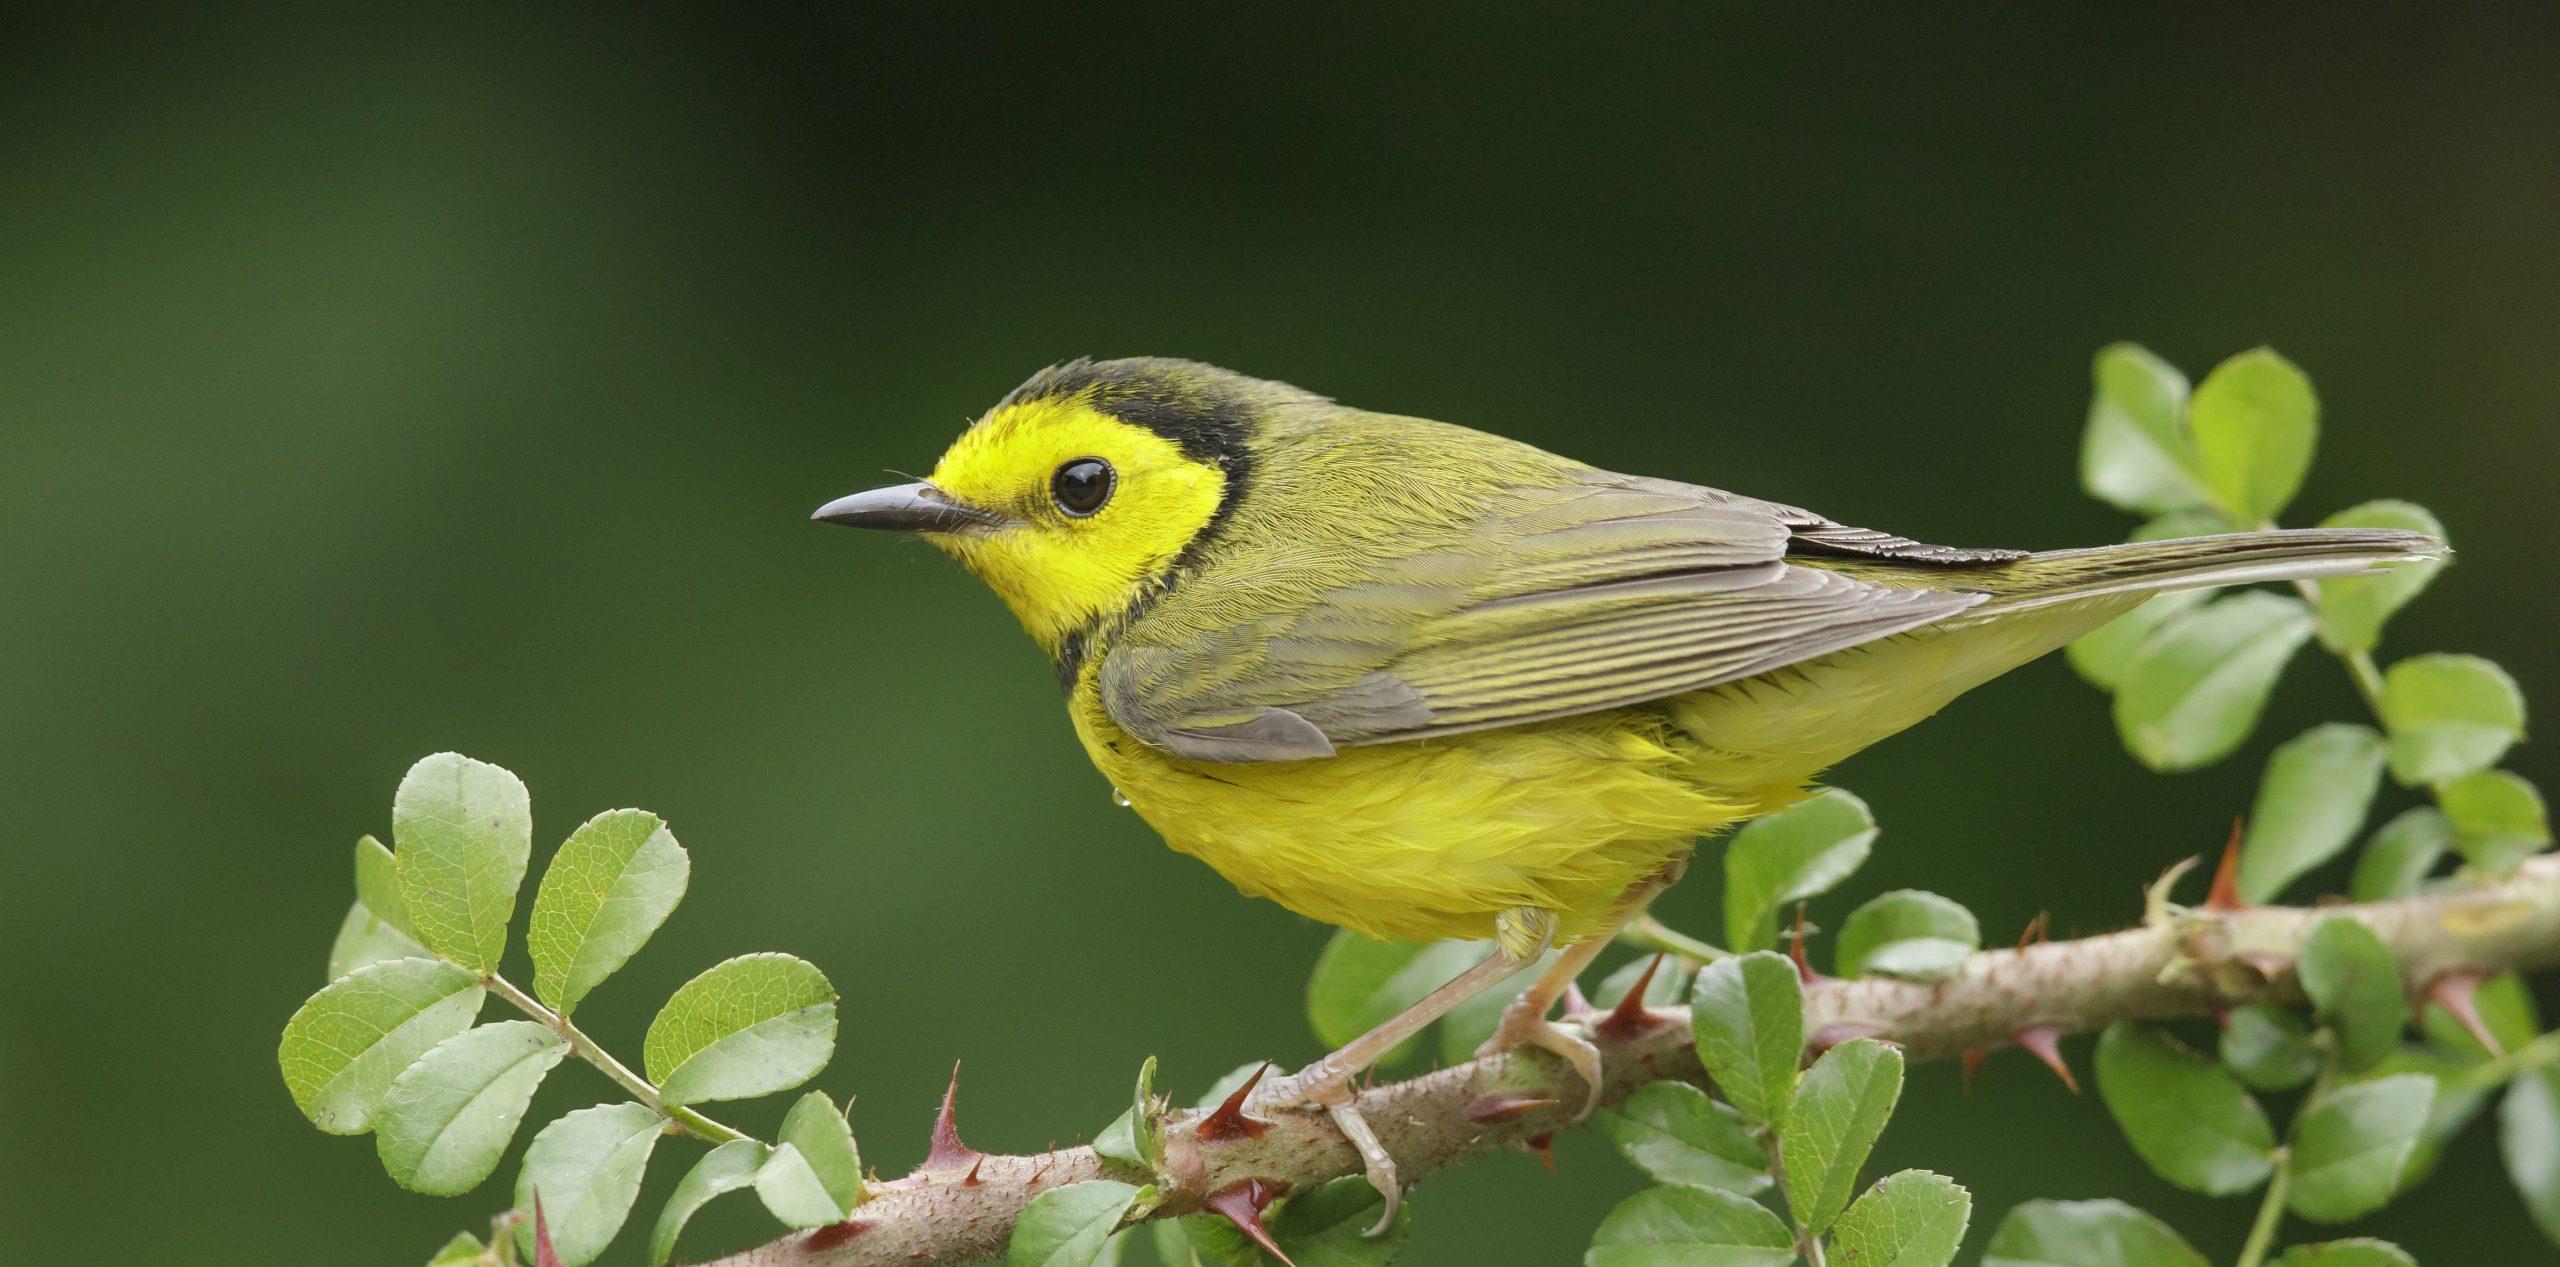 Warbler Birdwatching